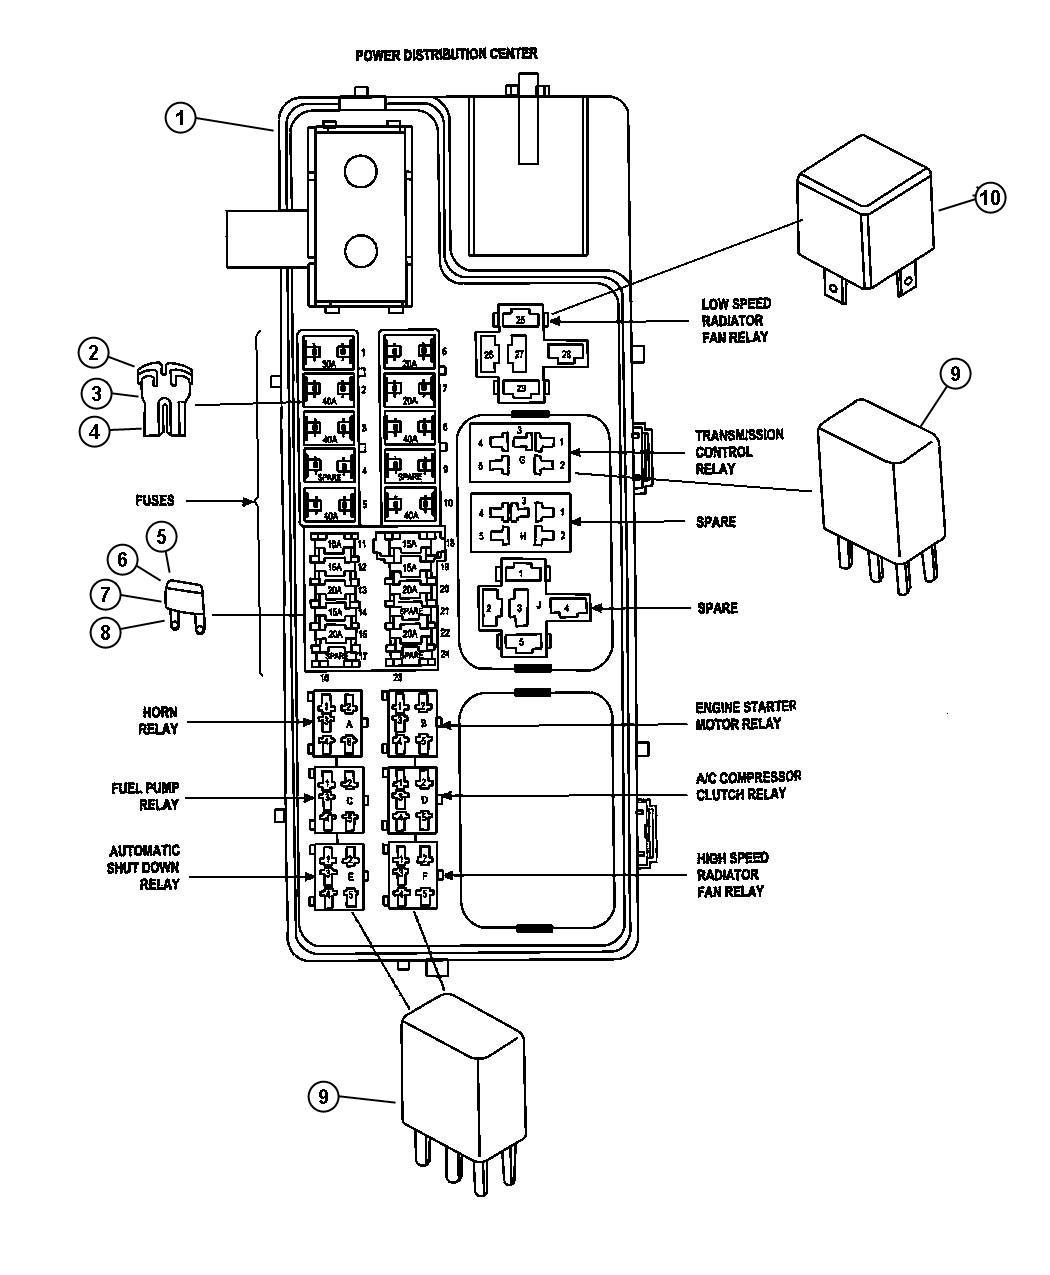 similiar 2003 pt cruiser ac parts diagram keywords fuses power distribution center for 2003 chrysler pt cruiser